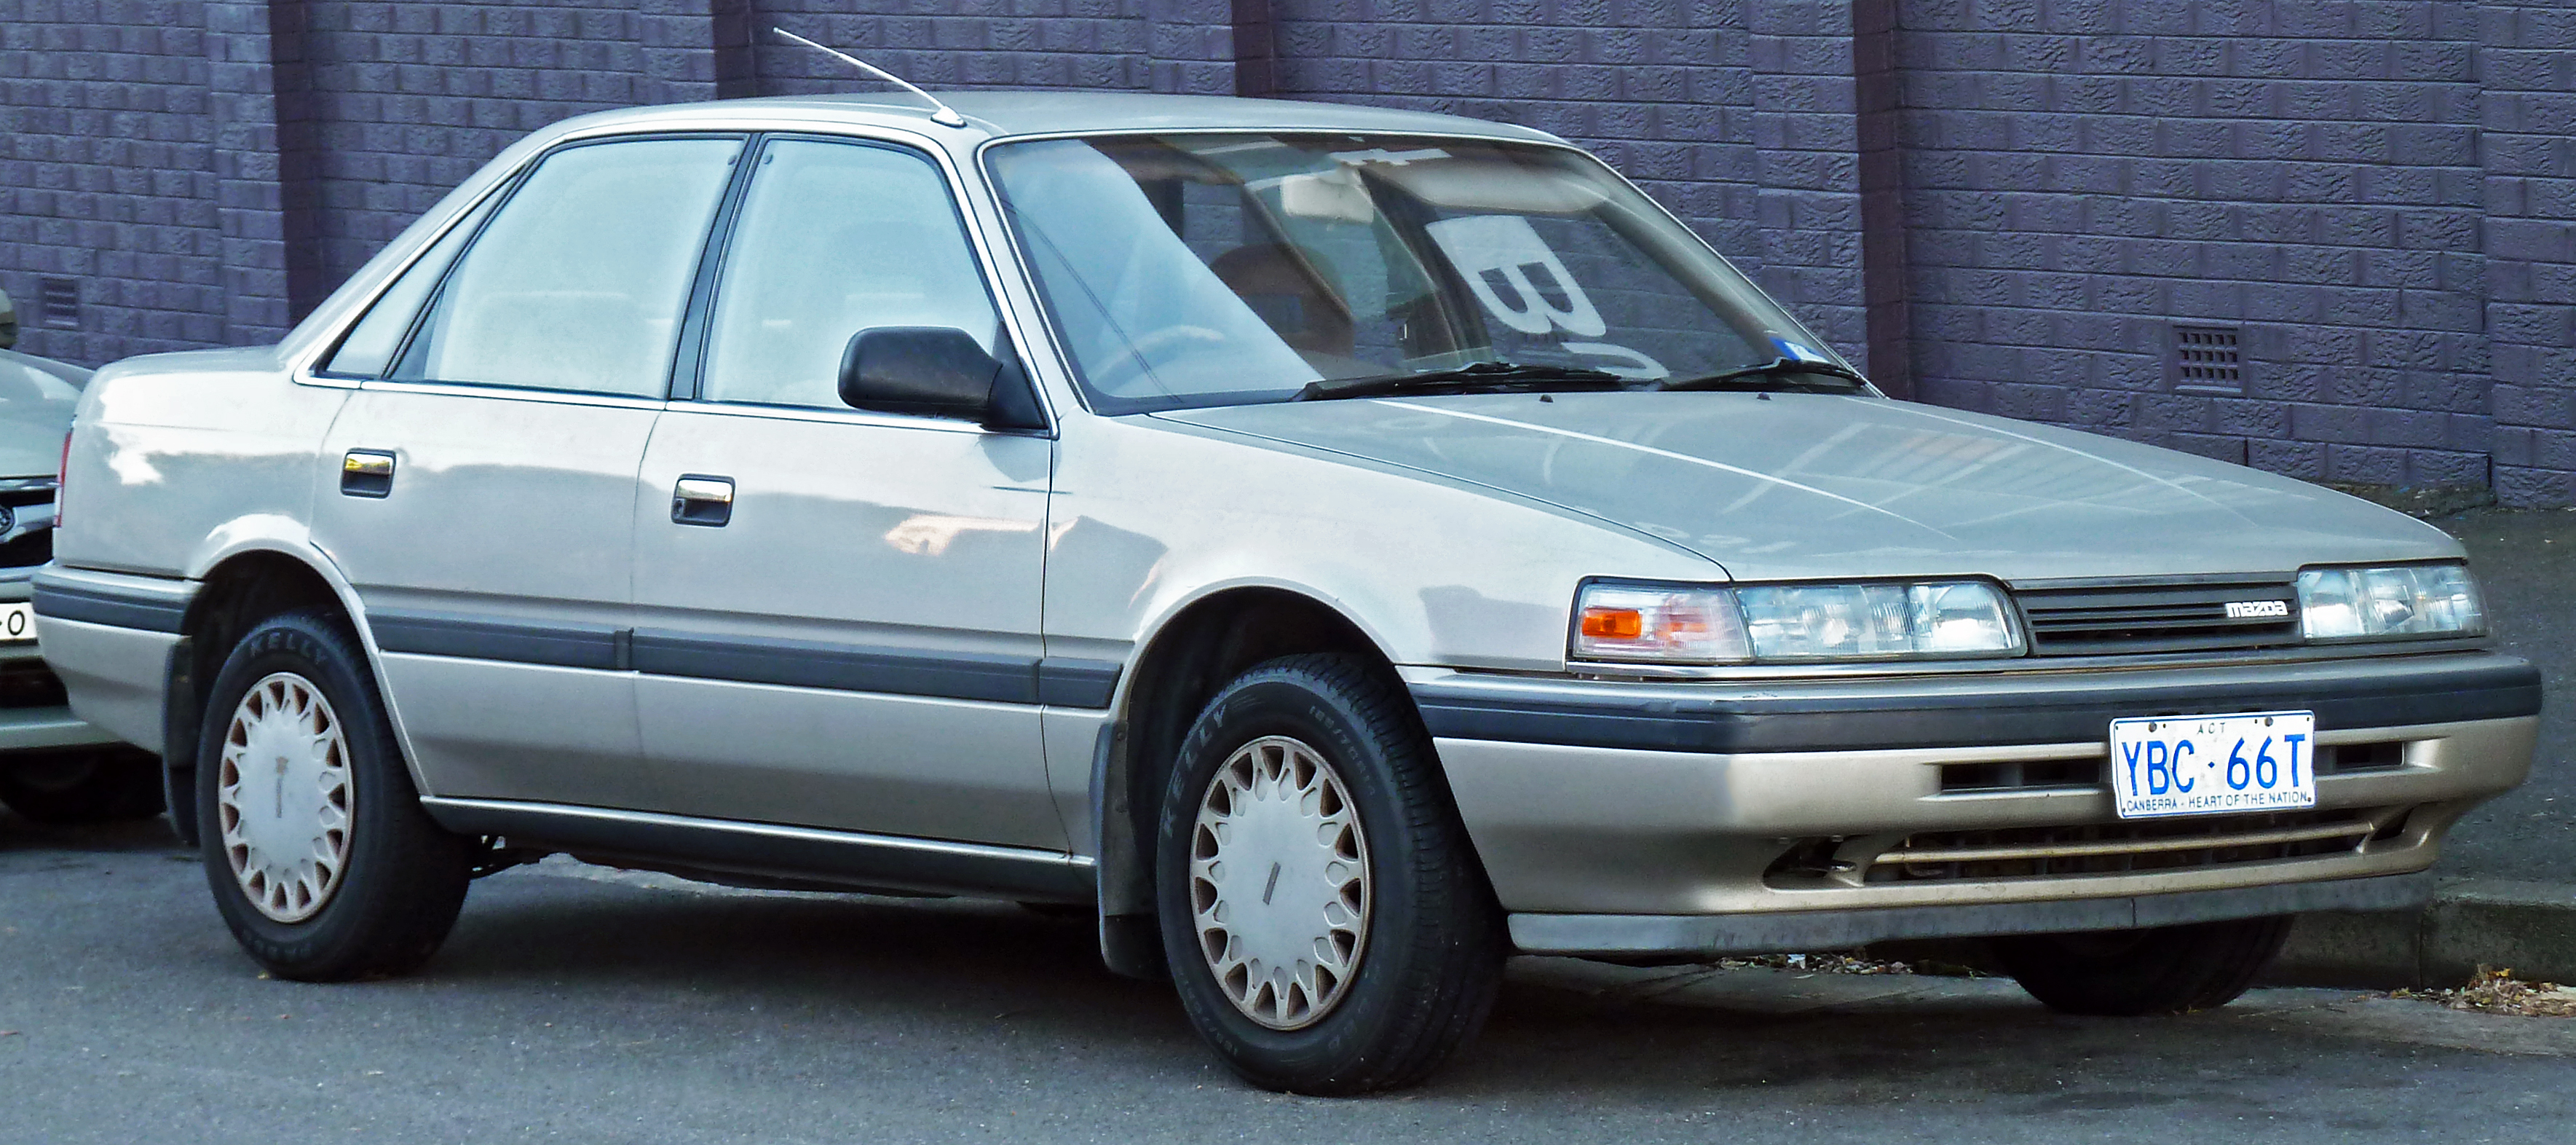 1990 Mazda 626 Image 4